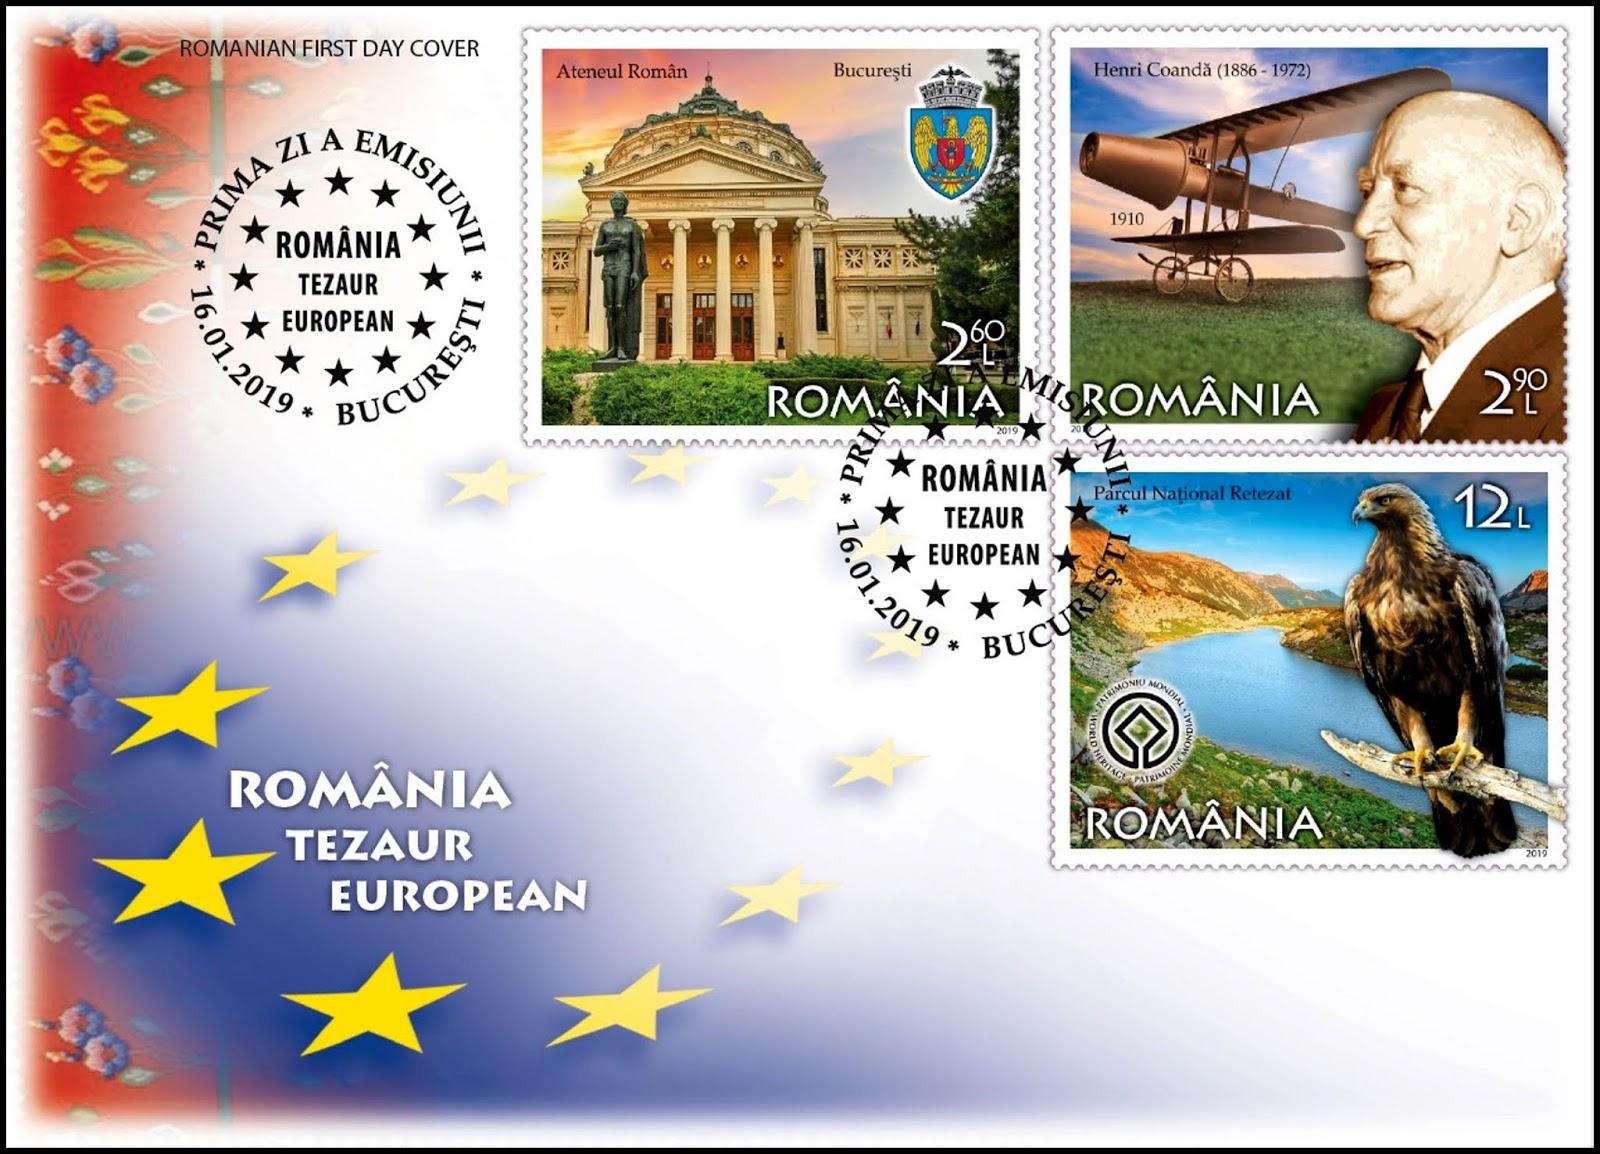 Romania - A European Treasure (January 16, 2019) first day cover #1